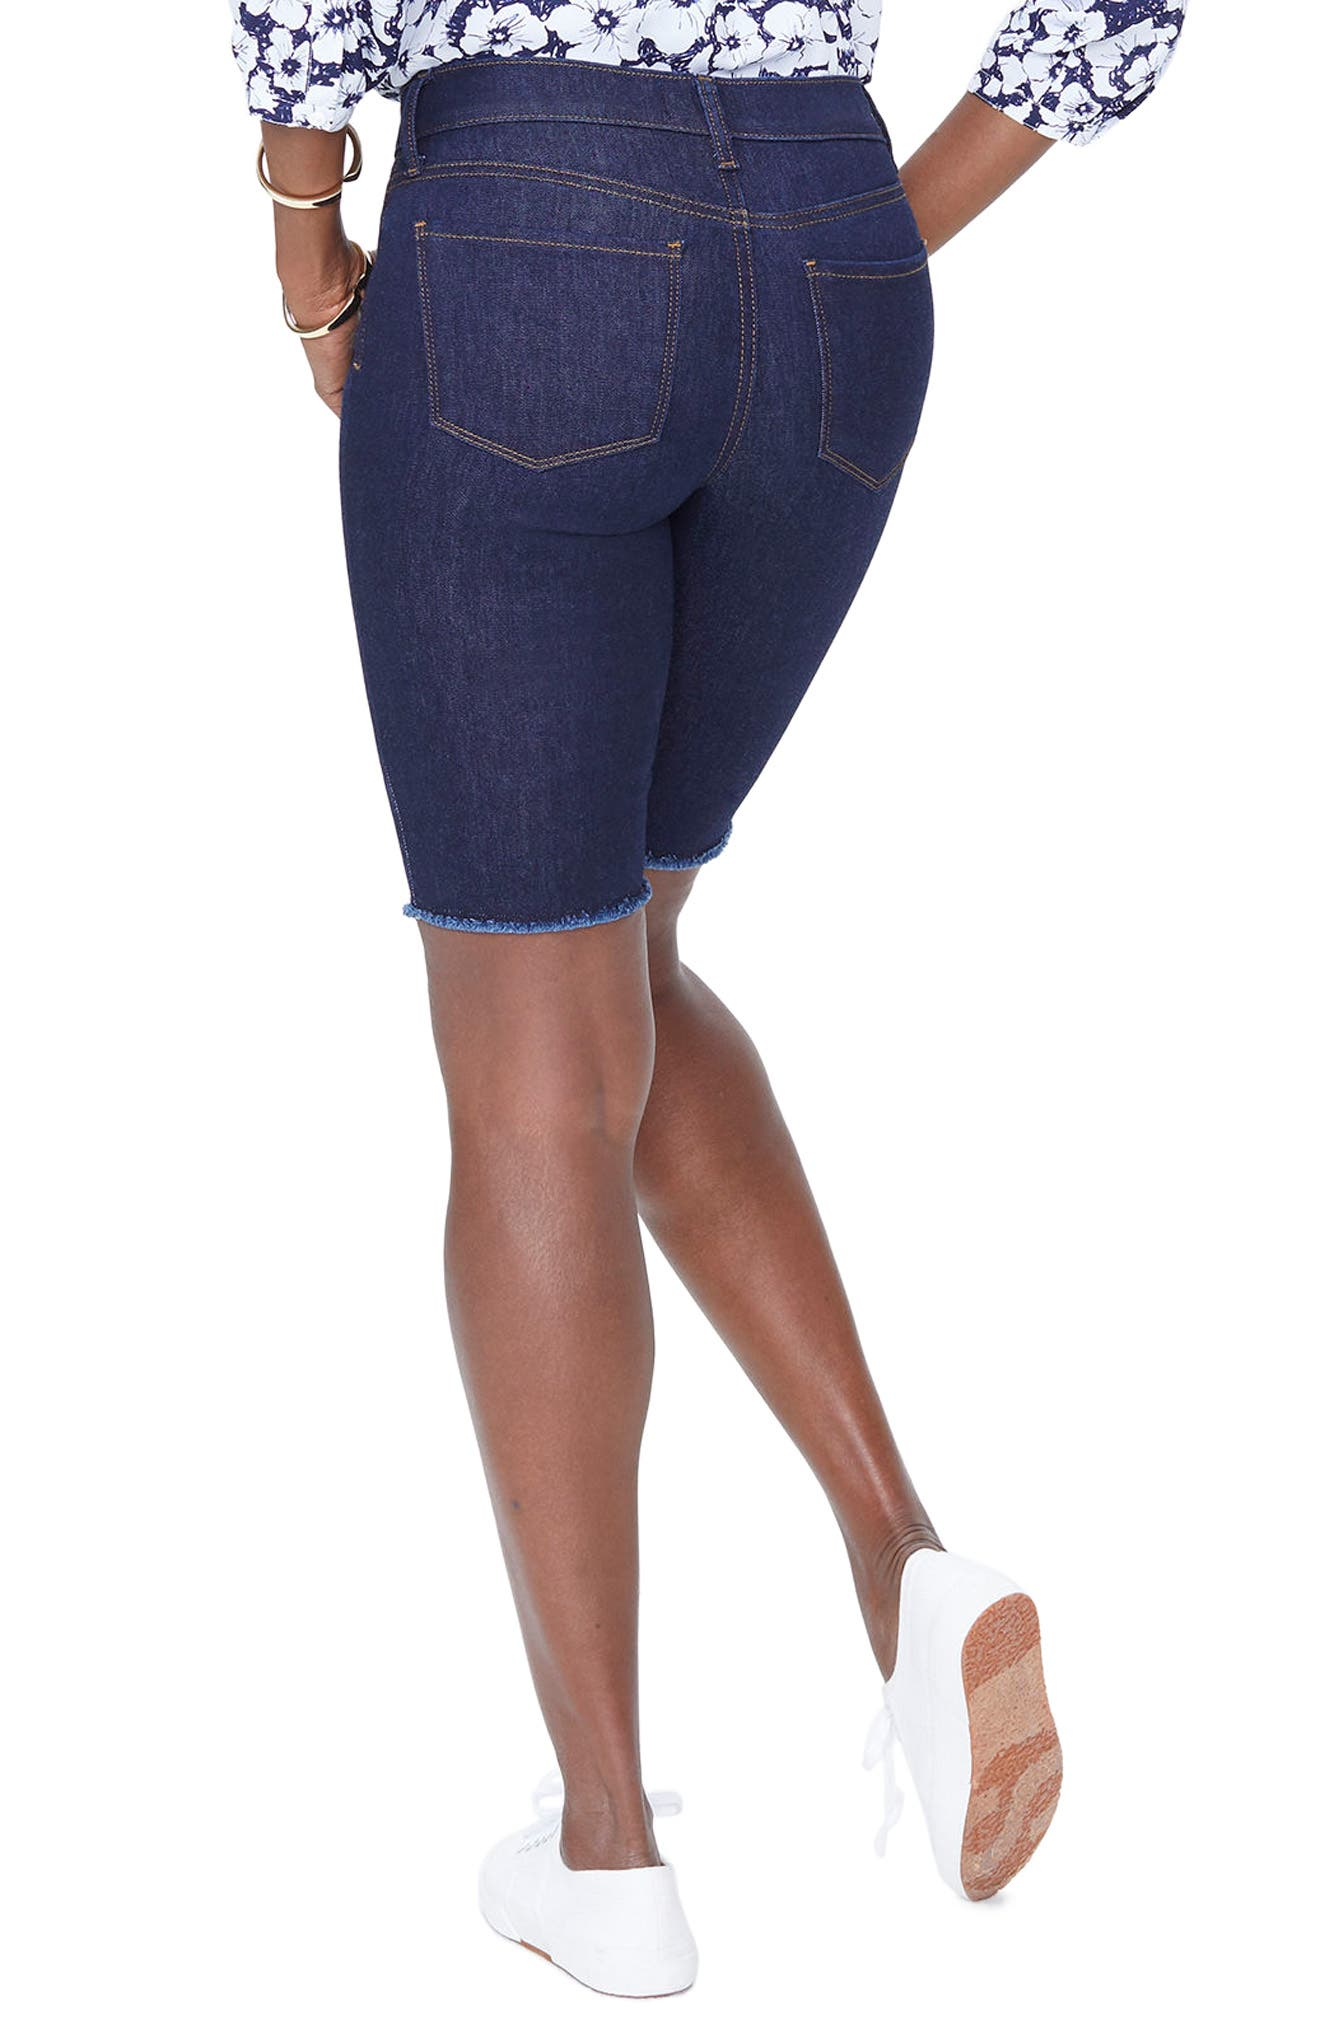 Briella Fray Hem Denim Bermuda Shorts,                             Alternate thumbnail 2, color,                             408